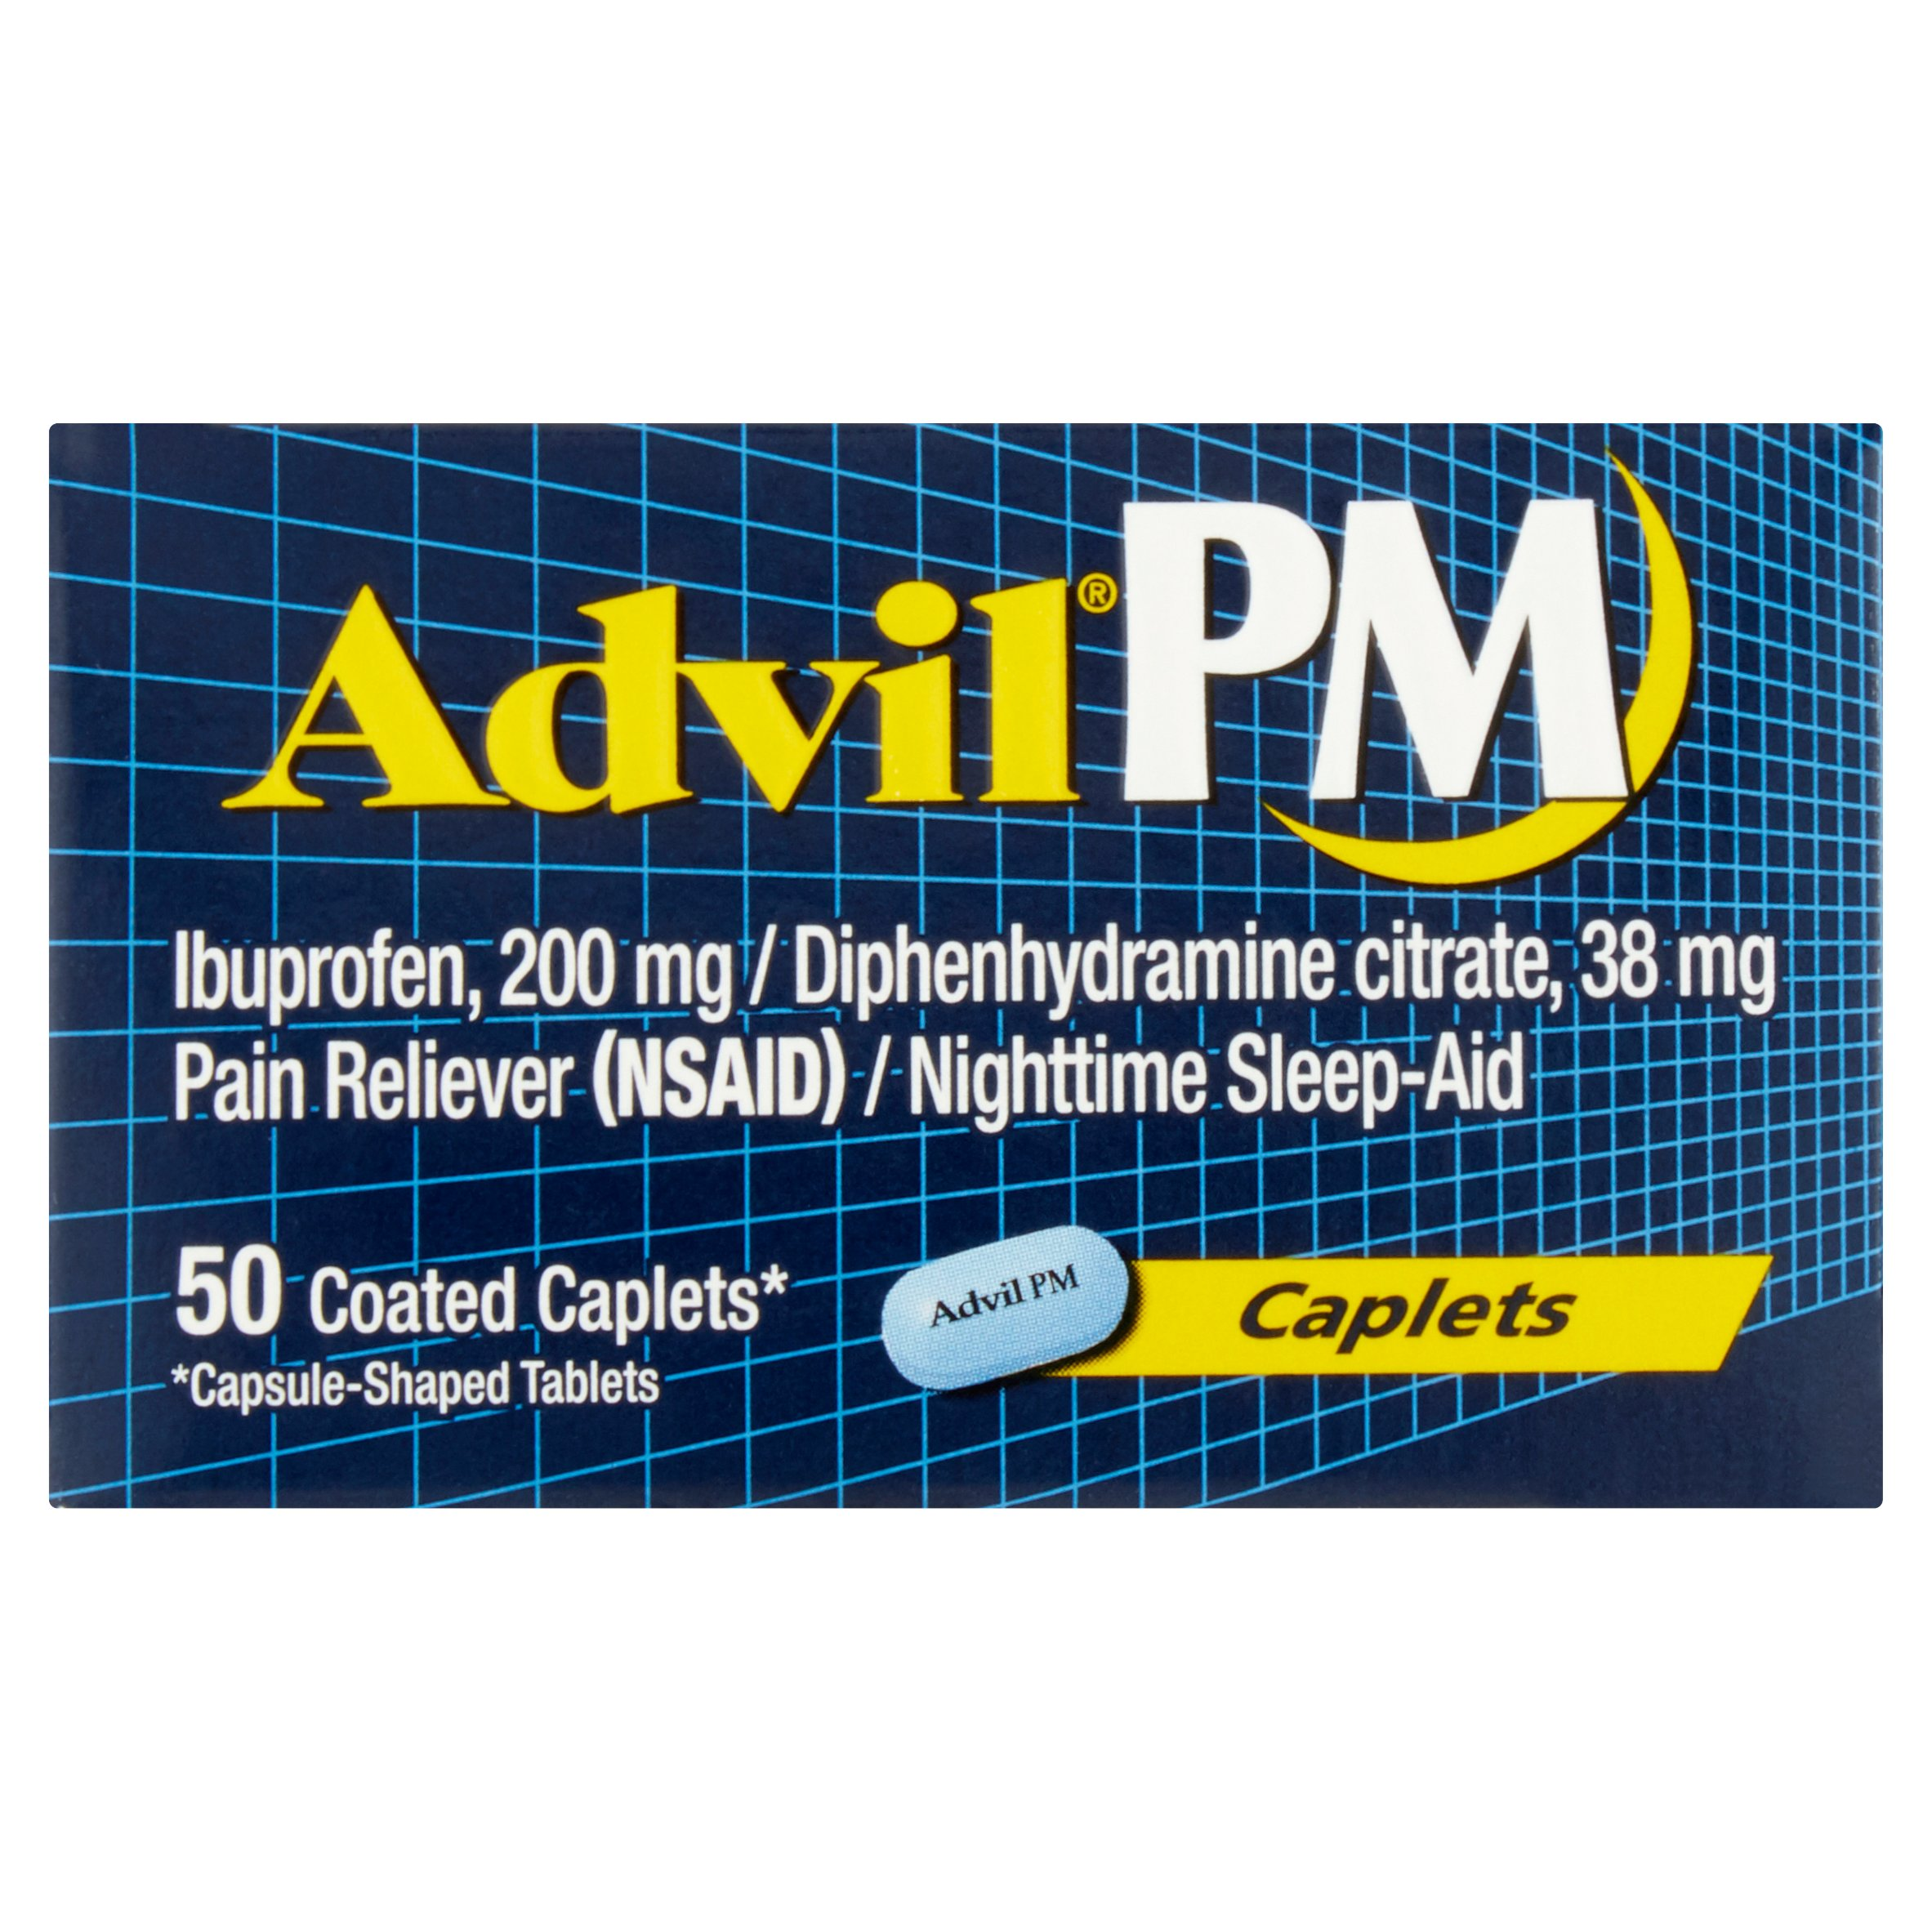 Advil PM (50 Count) Pain Reliever / Nighttime Sleep Aid Caplet, 200mg  Ibuprofen